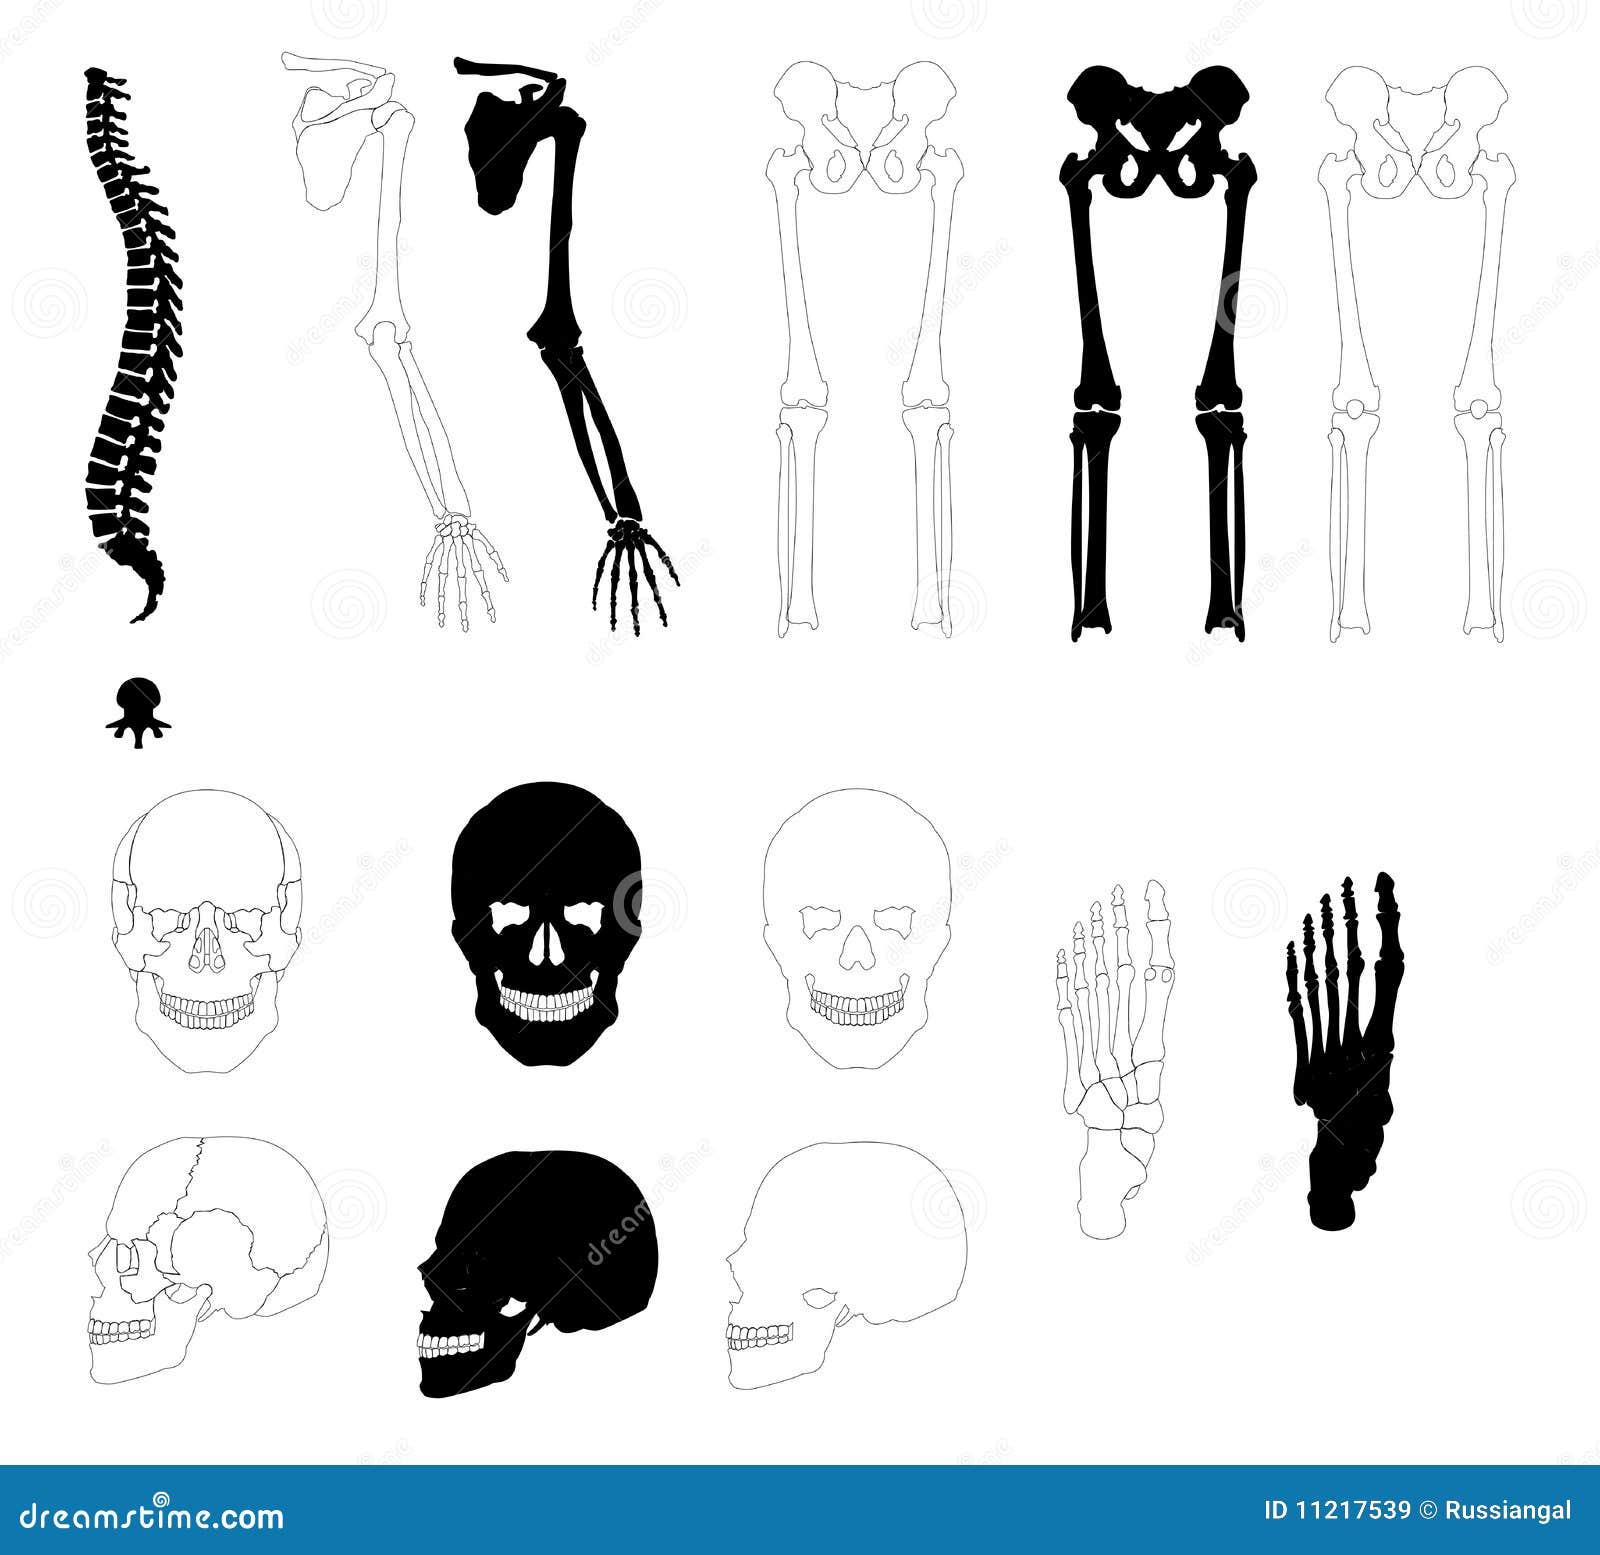 Huesos humanos stock de ilustración. Ilustración de herniated - 11217539